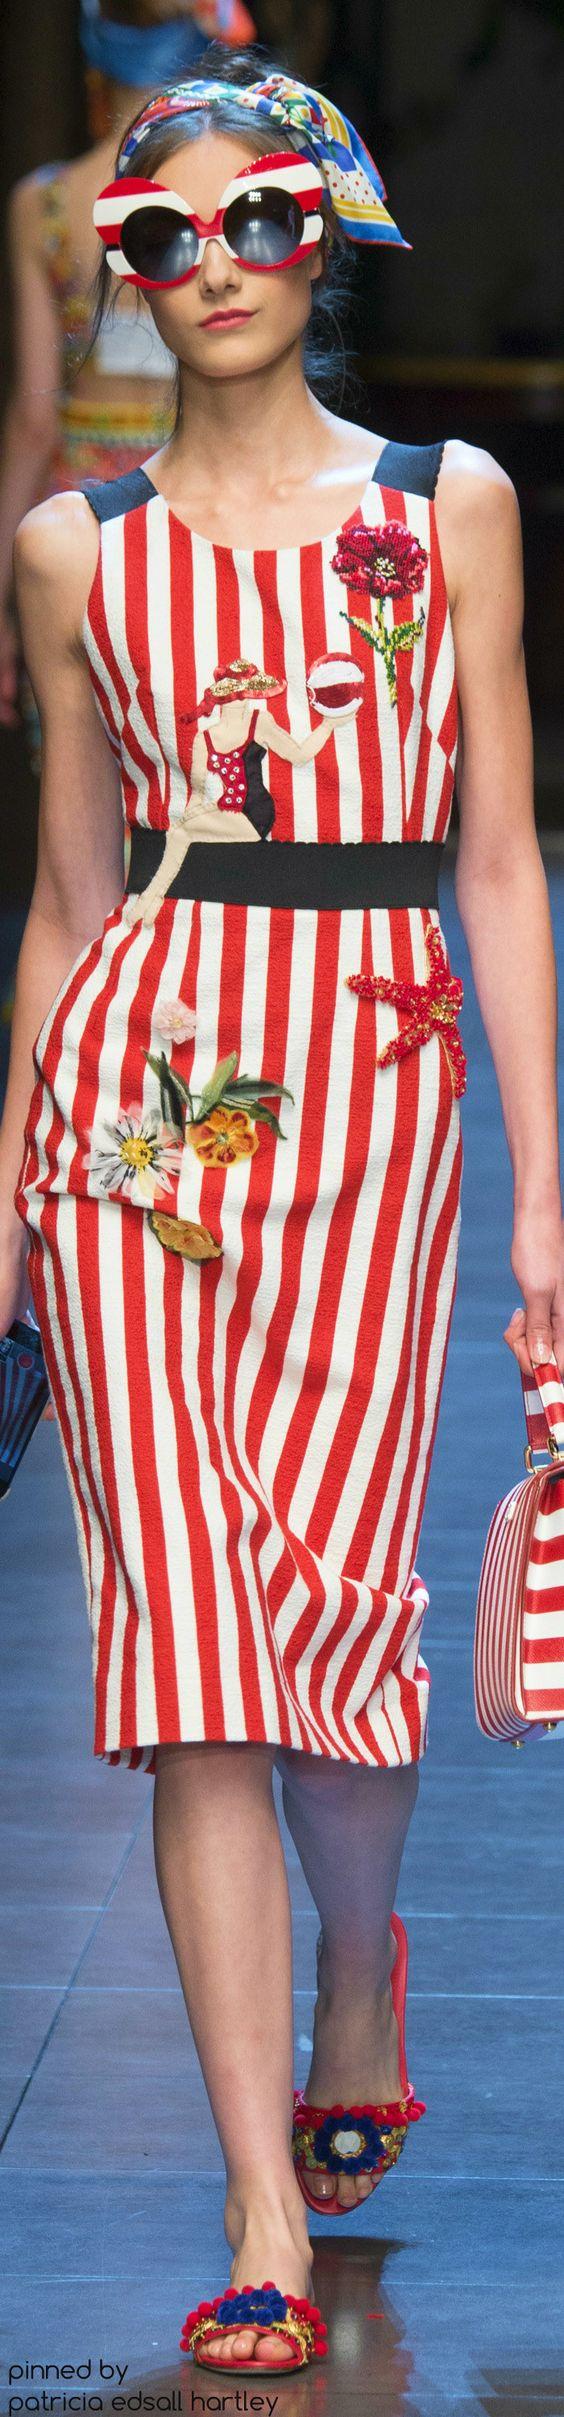 #Farbbberatung #Stilberatung #Farbenreich mit www.farben-reich.com SPRING 2016 READY-TO-WEAR Dolce & Gabbana: